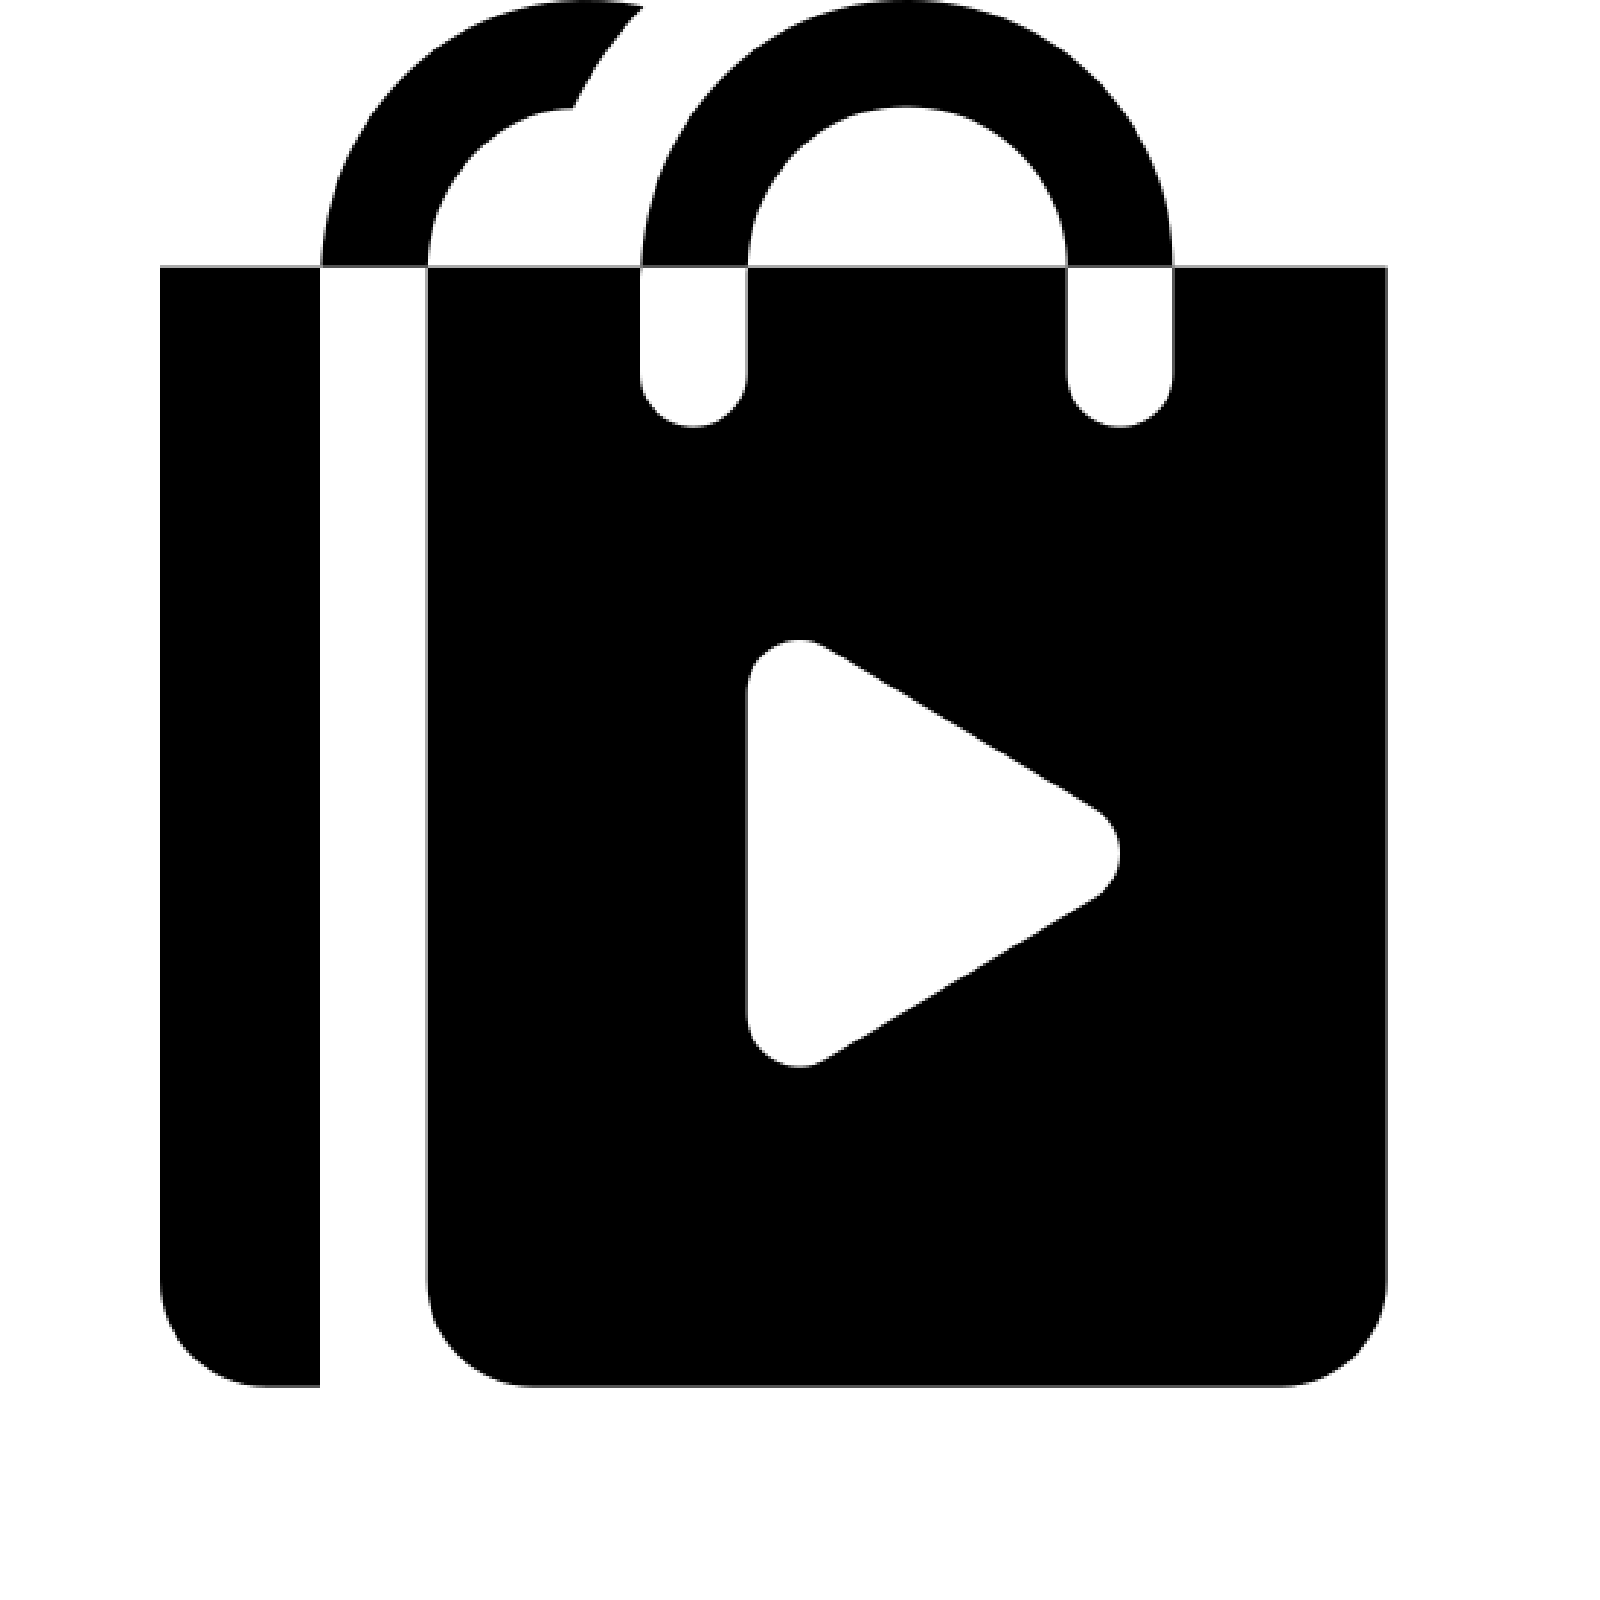 Loja dois icon